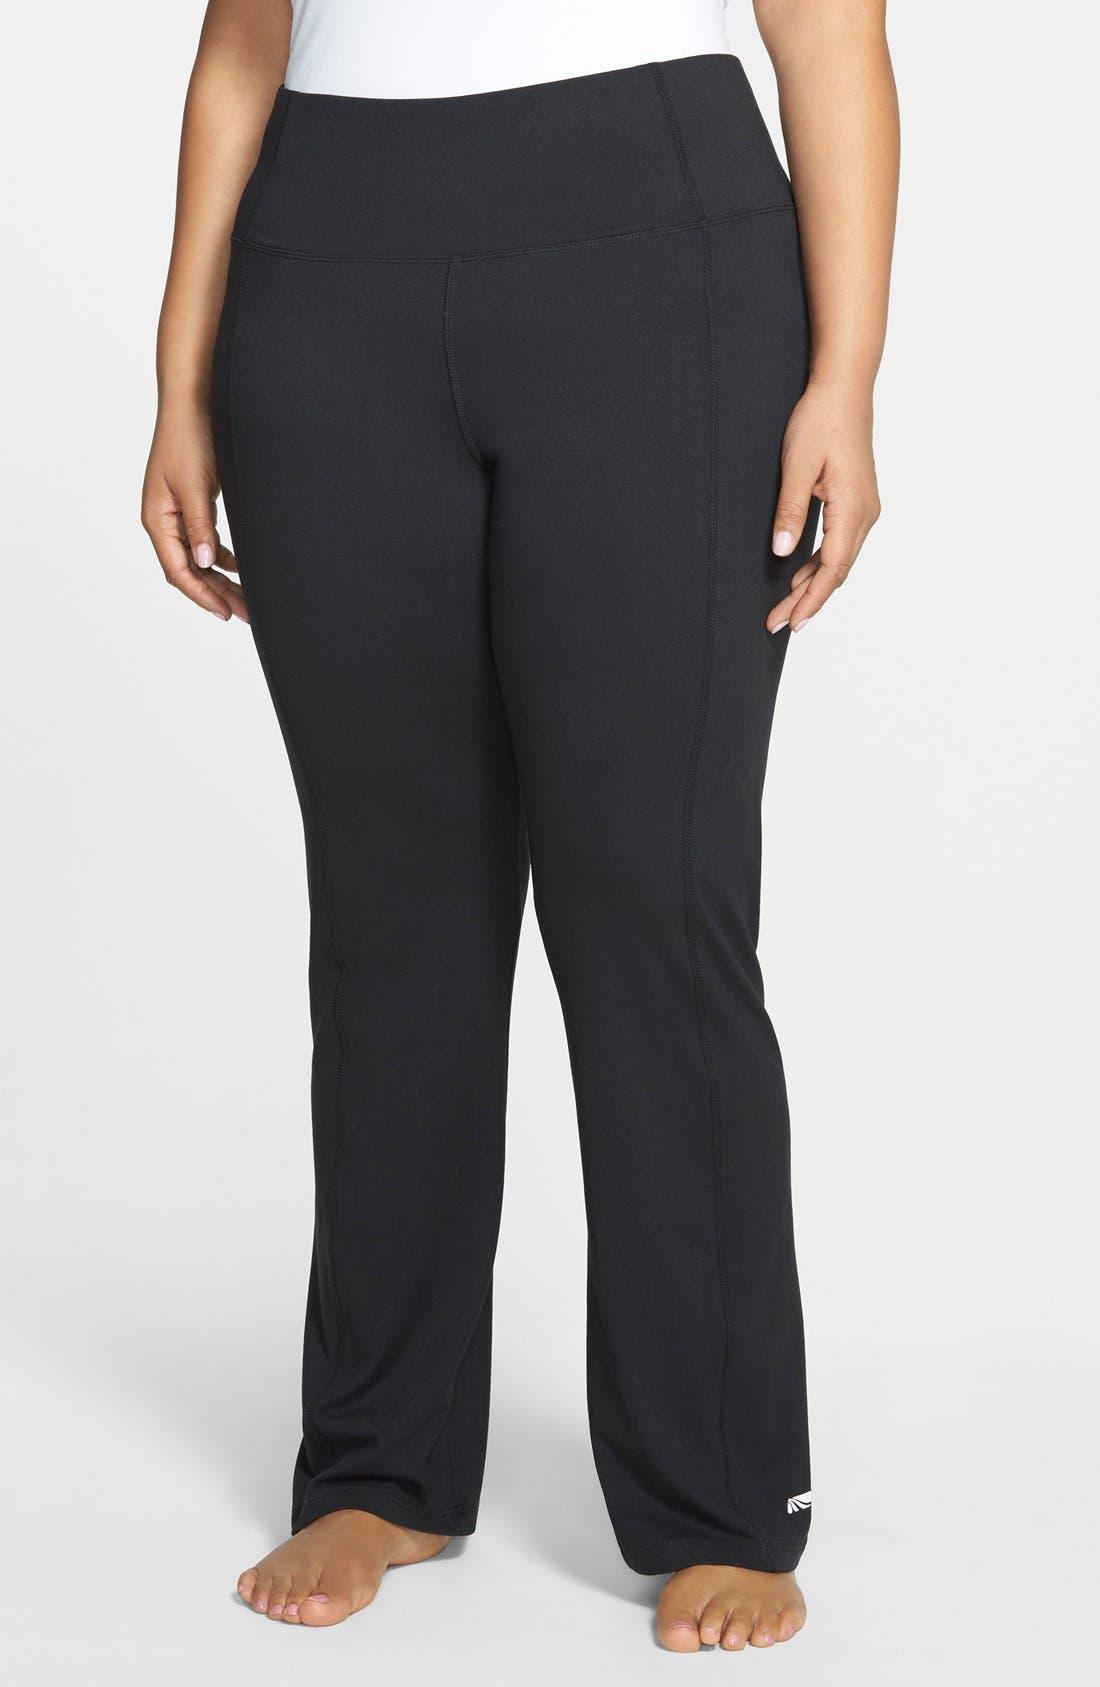 Main Image - Marika Curves High Rise Control Top Bootcut Pants (Plus Size)